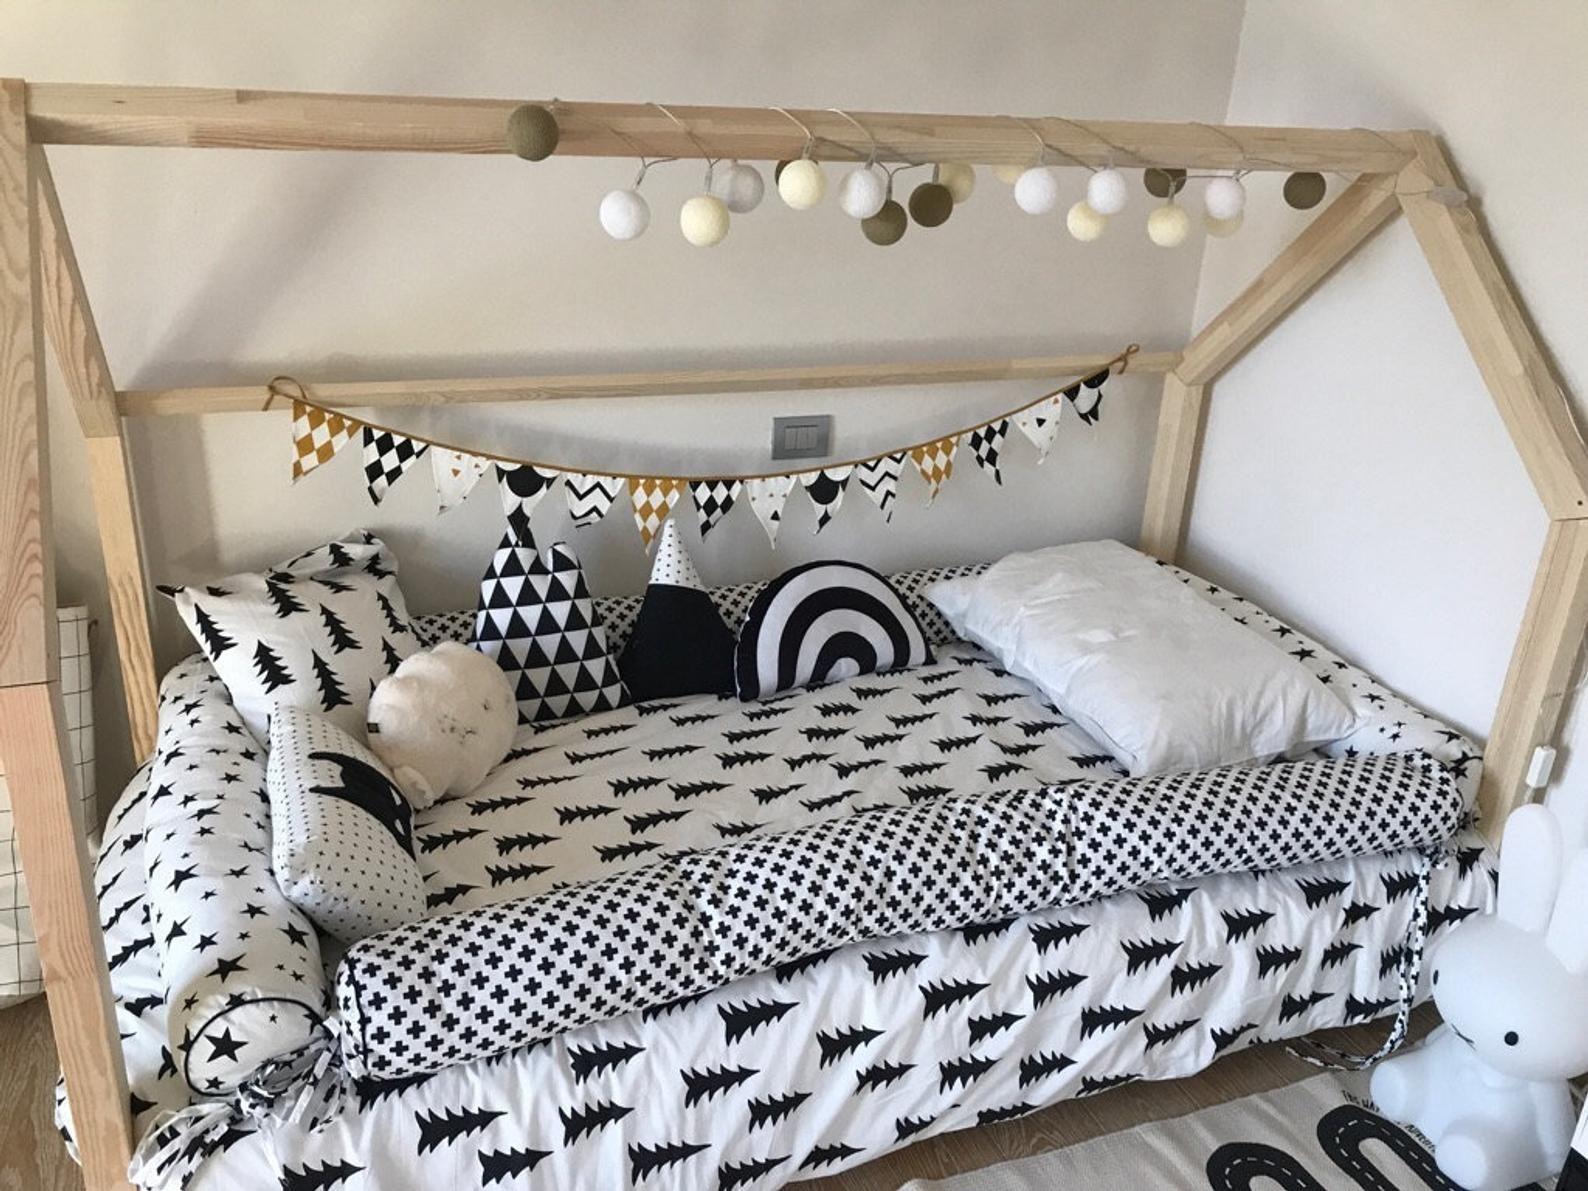 Montessori Floor bed bolster pillow